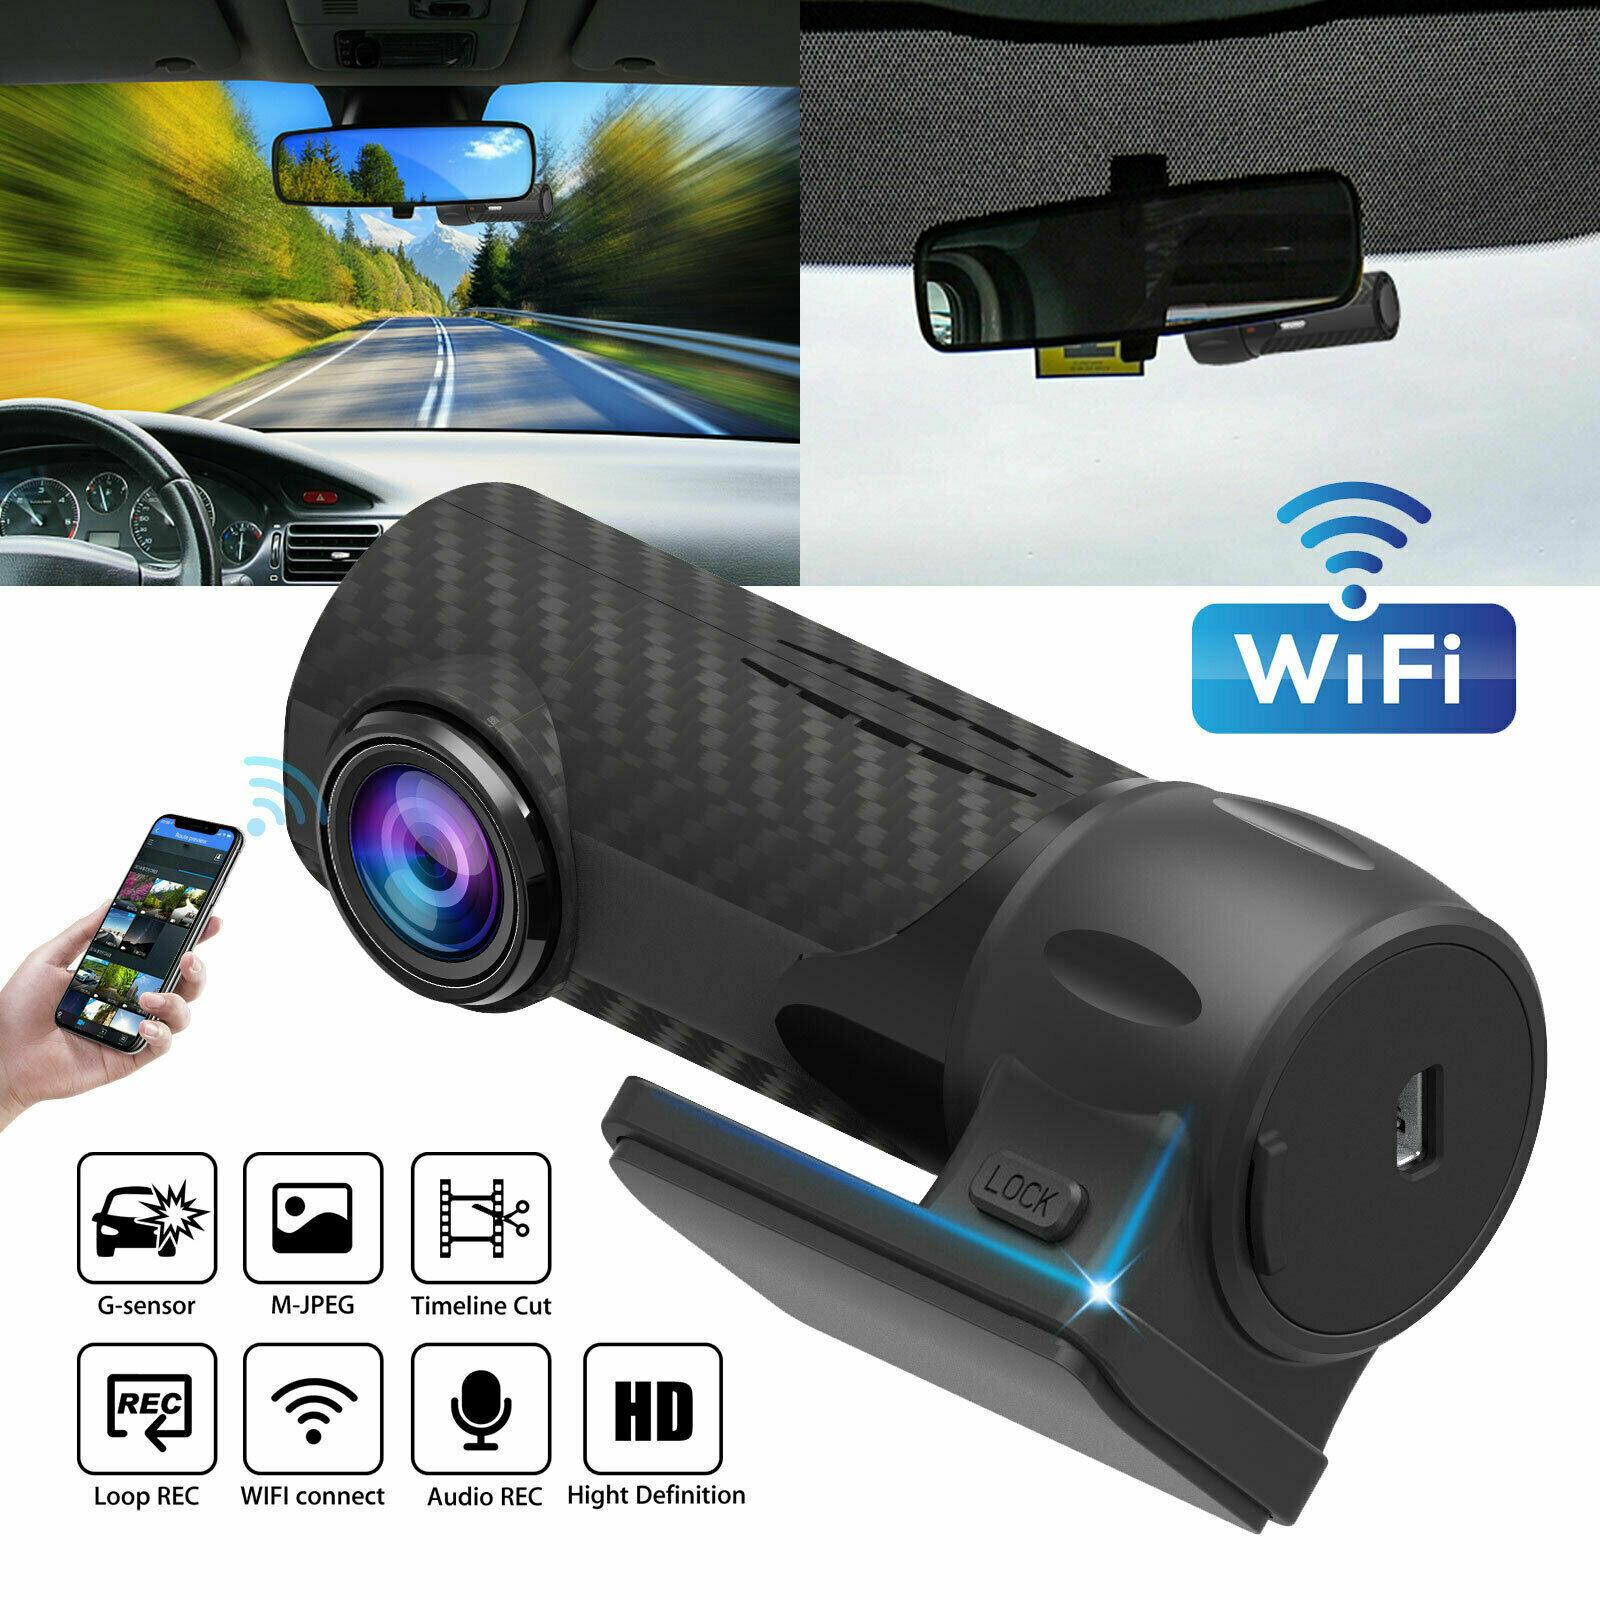 1080P HD Hidden Car DVR Camera WIFI Rear View Video Recorder Dash Cam for Cars with G-sensor loop parking monitor Car DVRs S700